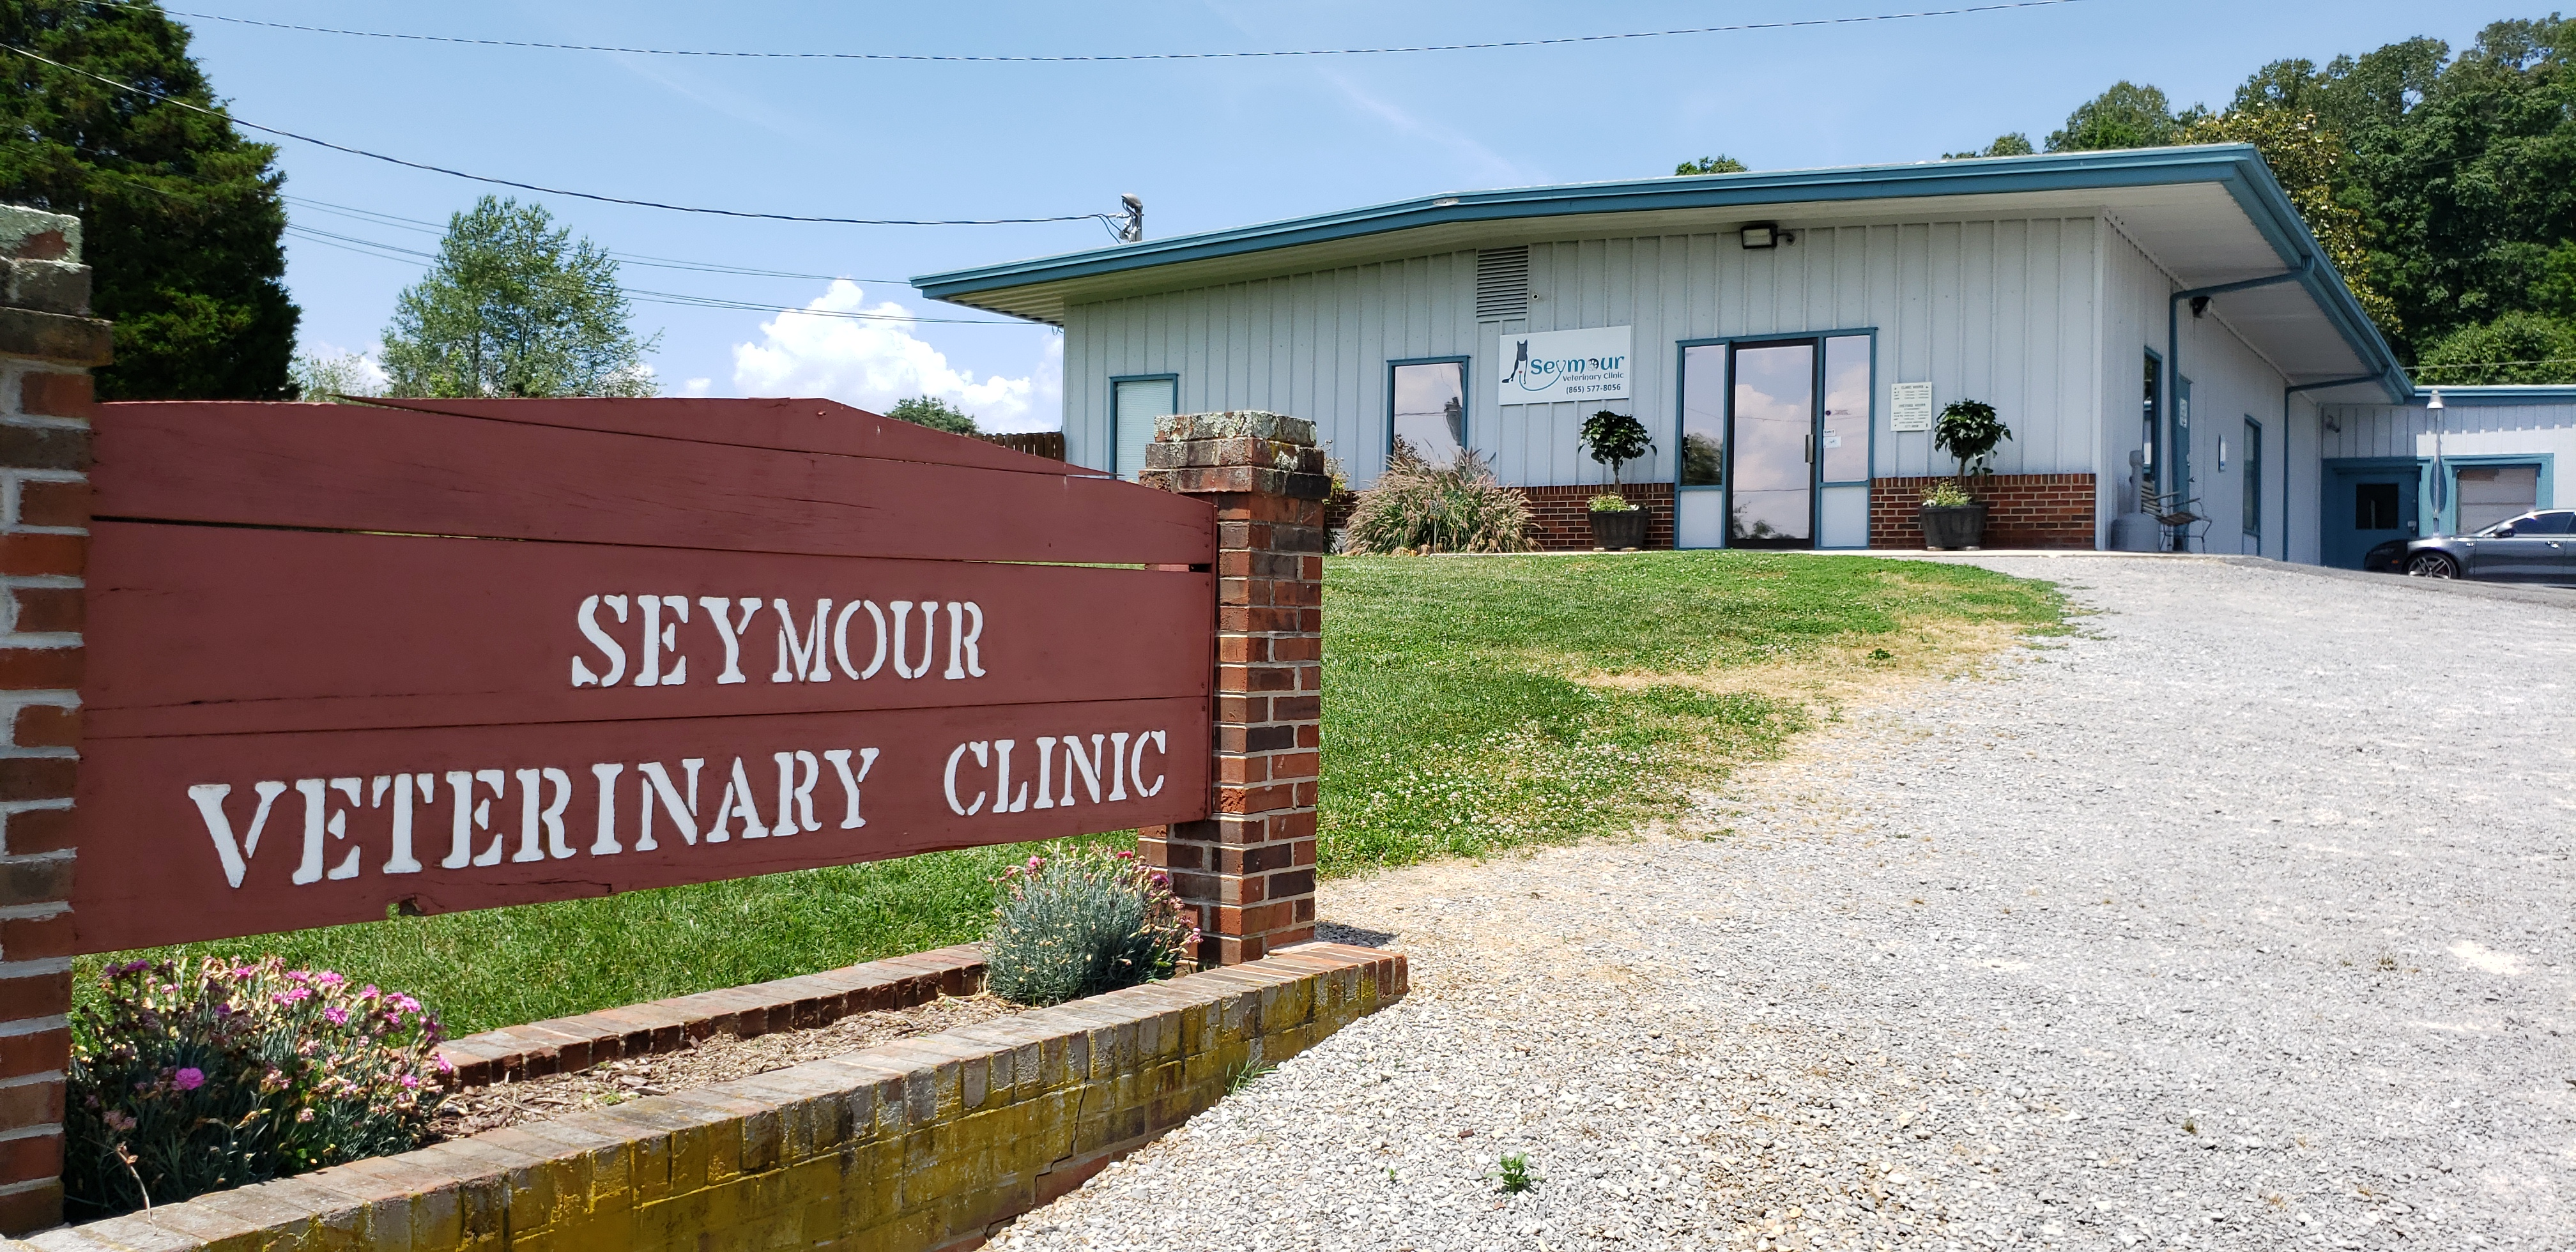 Seymour Veterinary Clinic - Seymour, TN